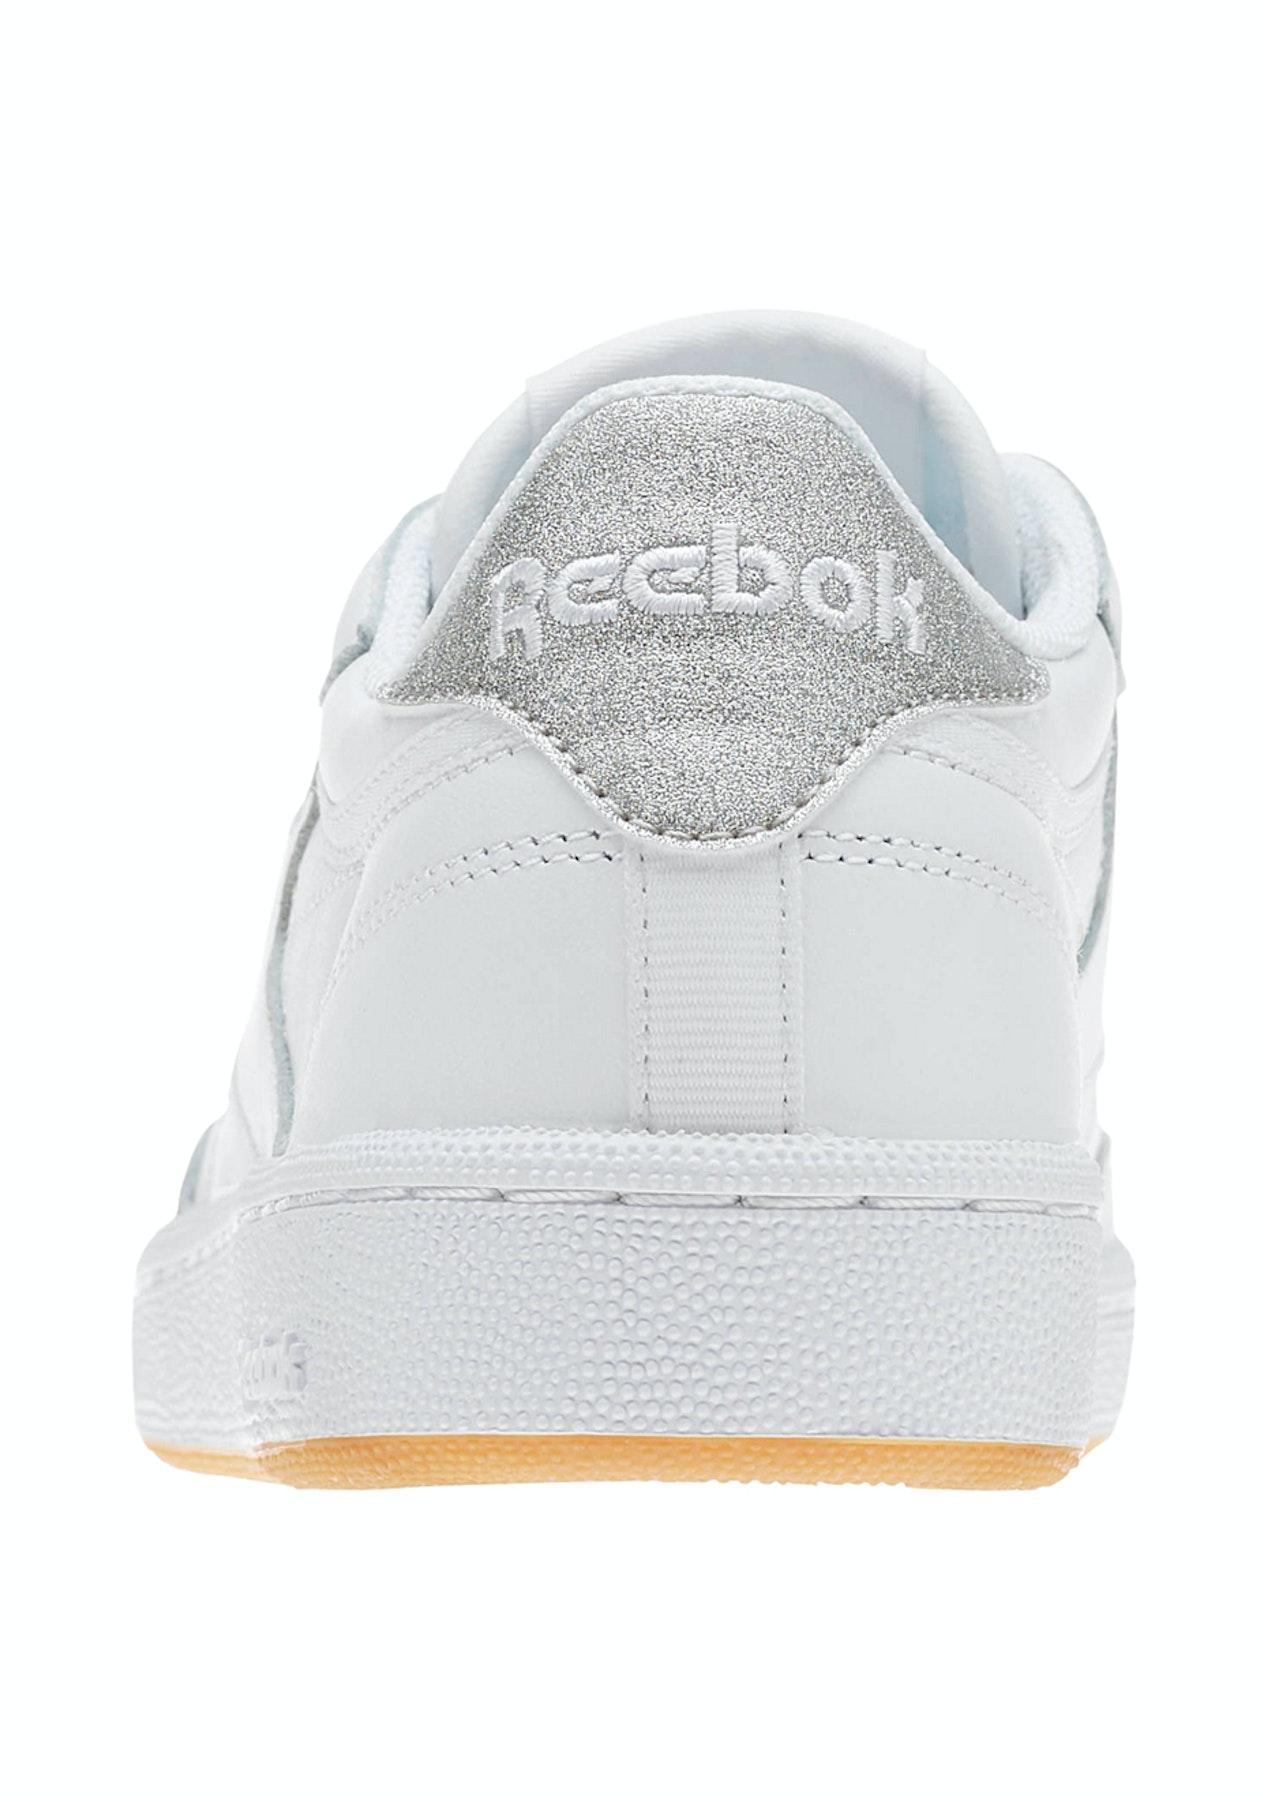 Reebok Womens - Club C 85 Diamond White Gum - Once a Year Reebok - Onceit 285d33610